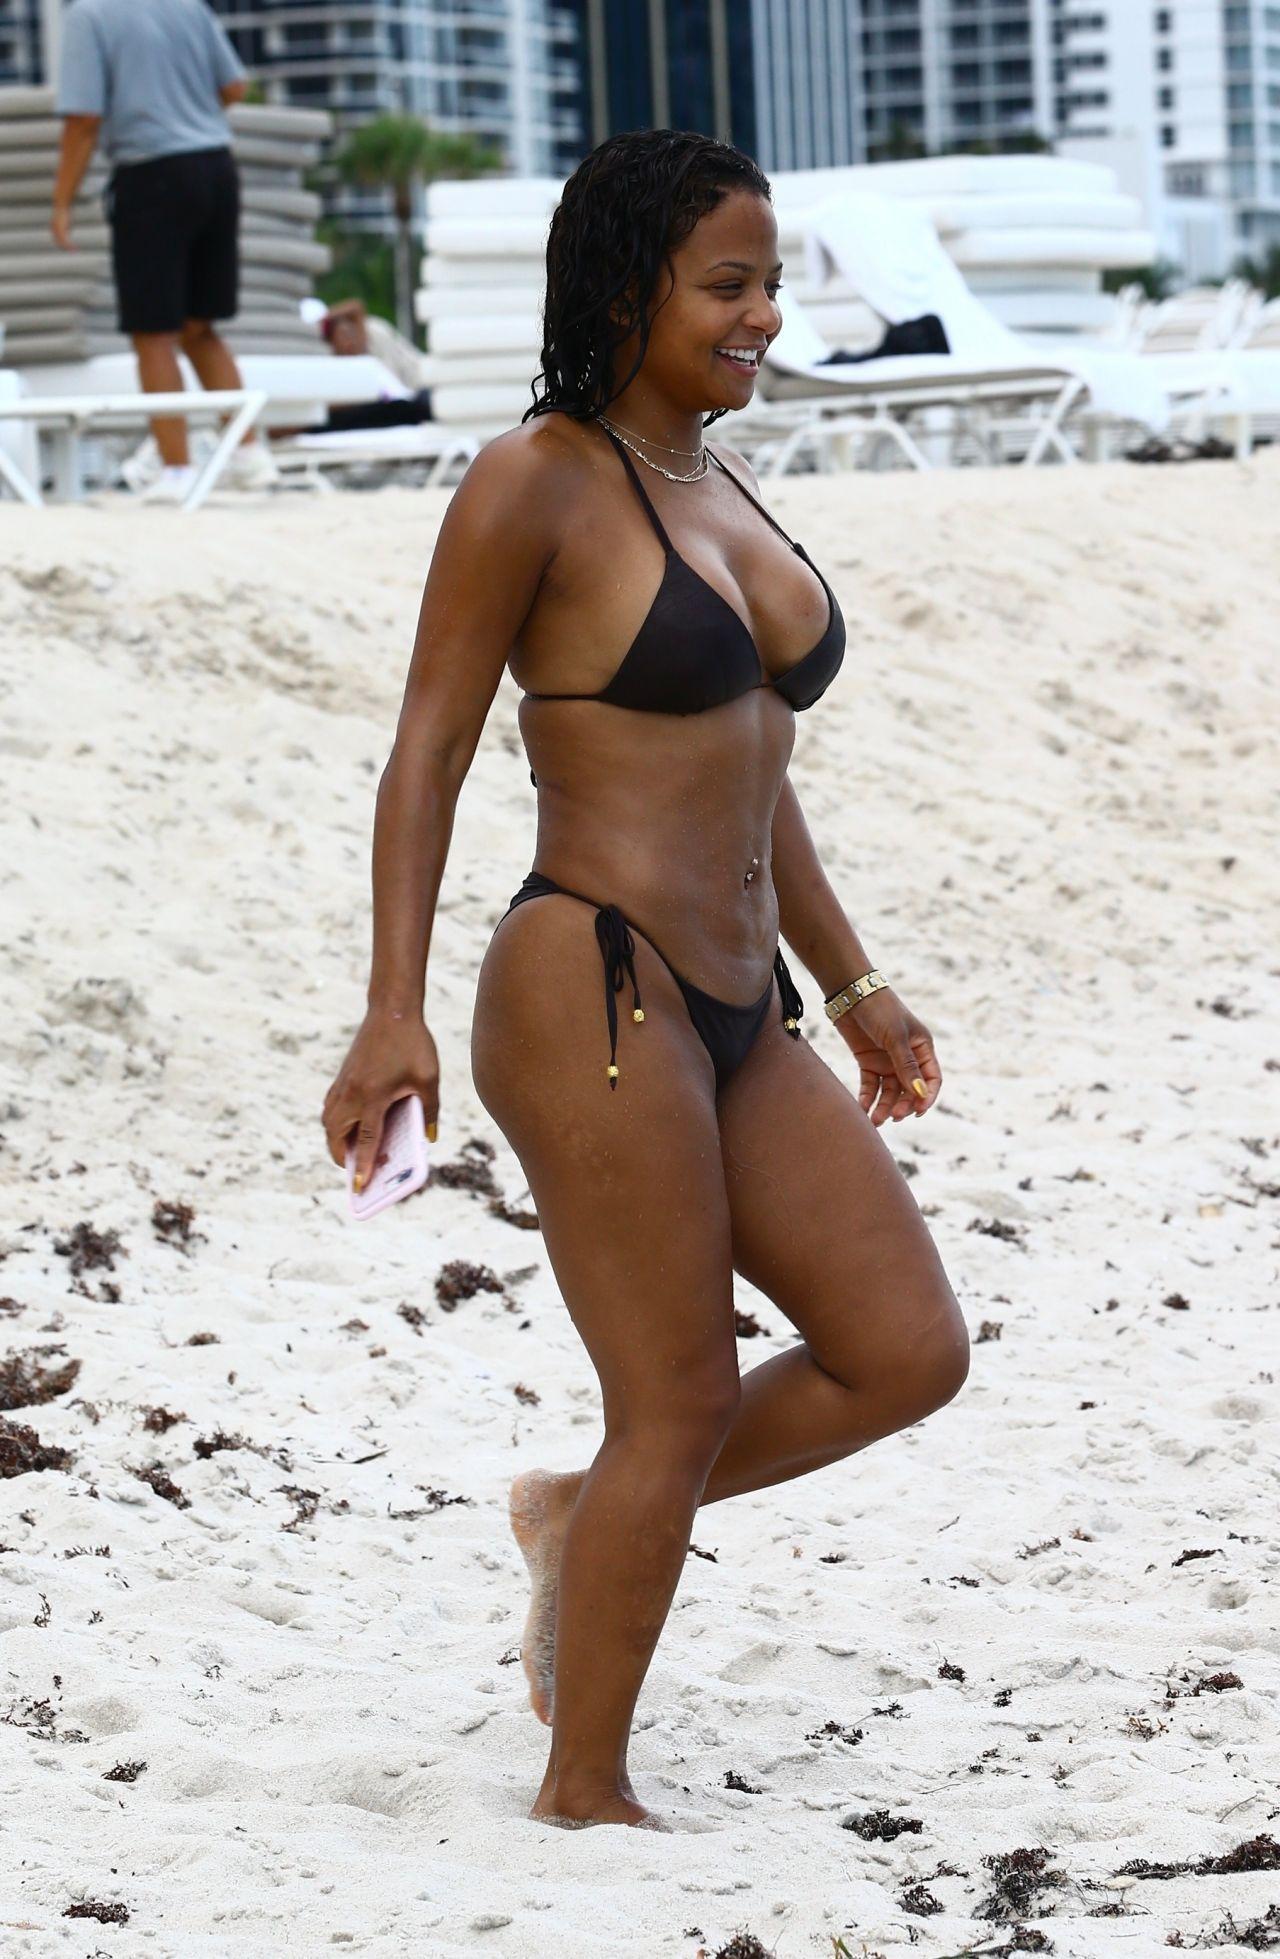 Christina milian on beach in miami 8